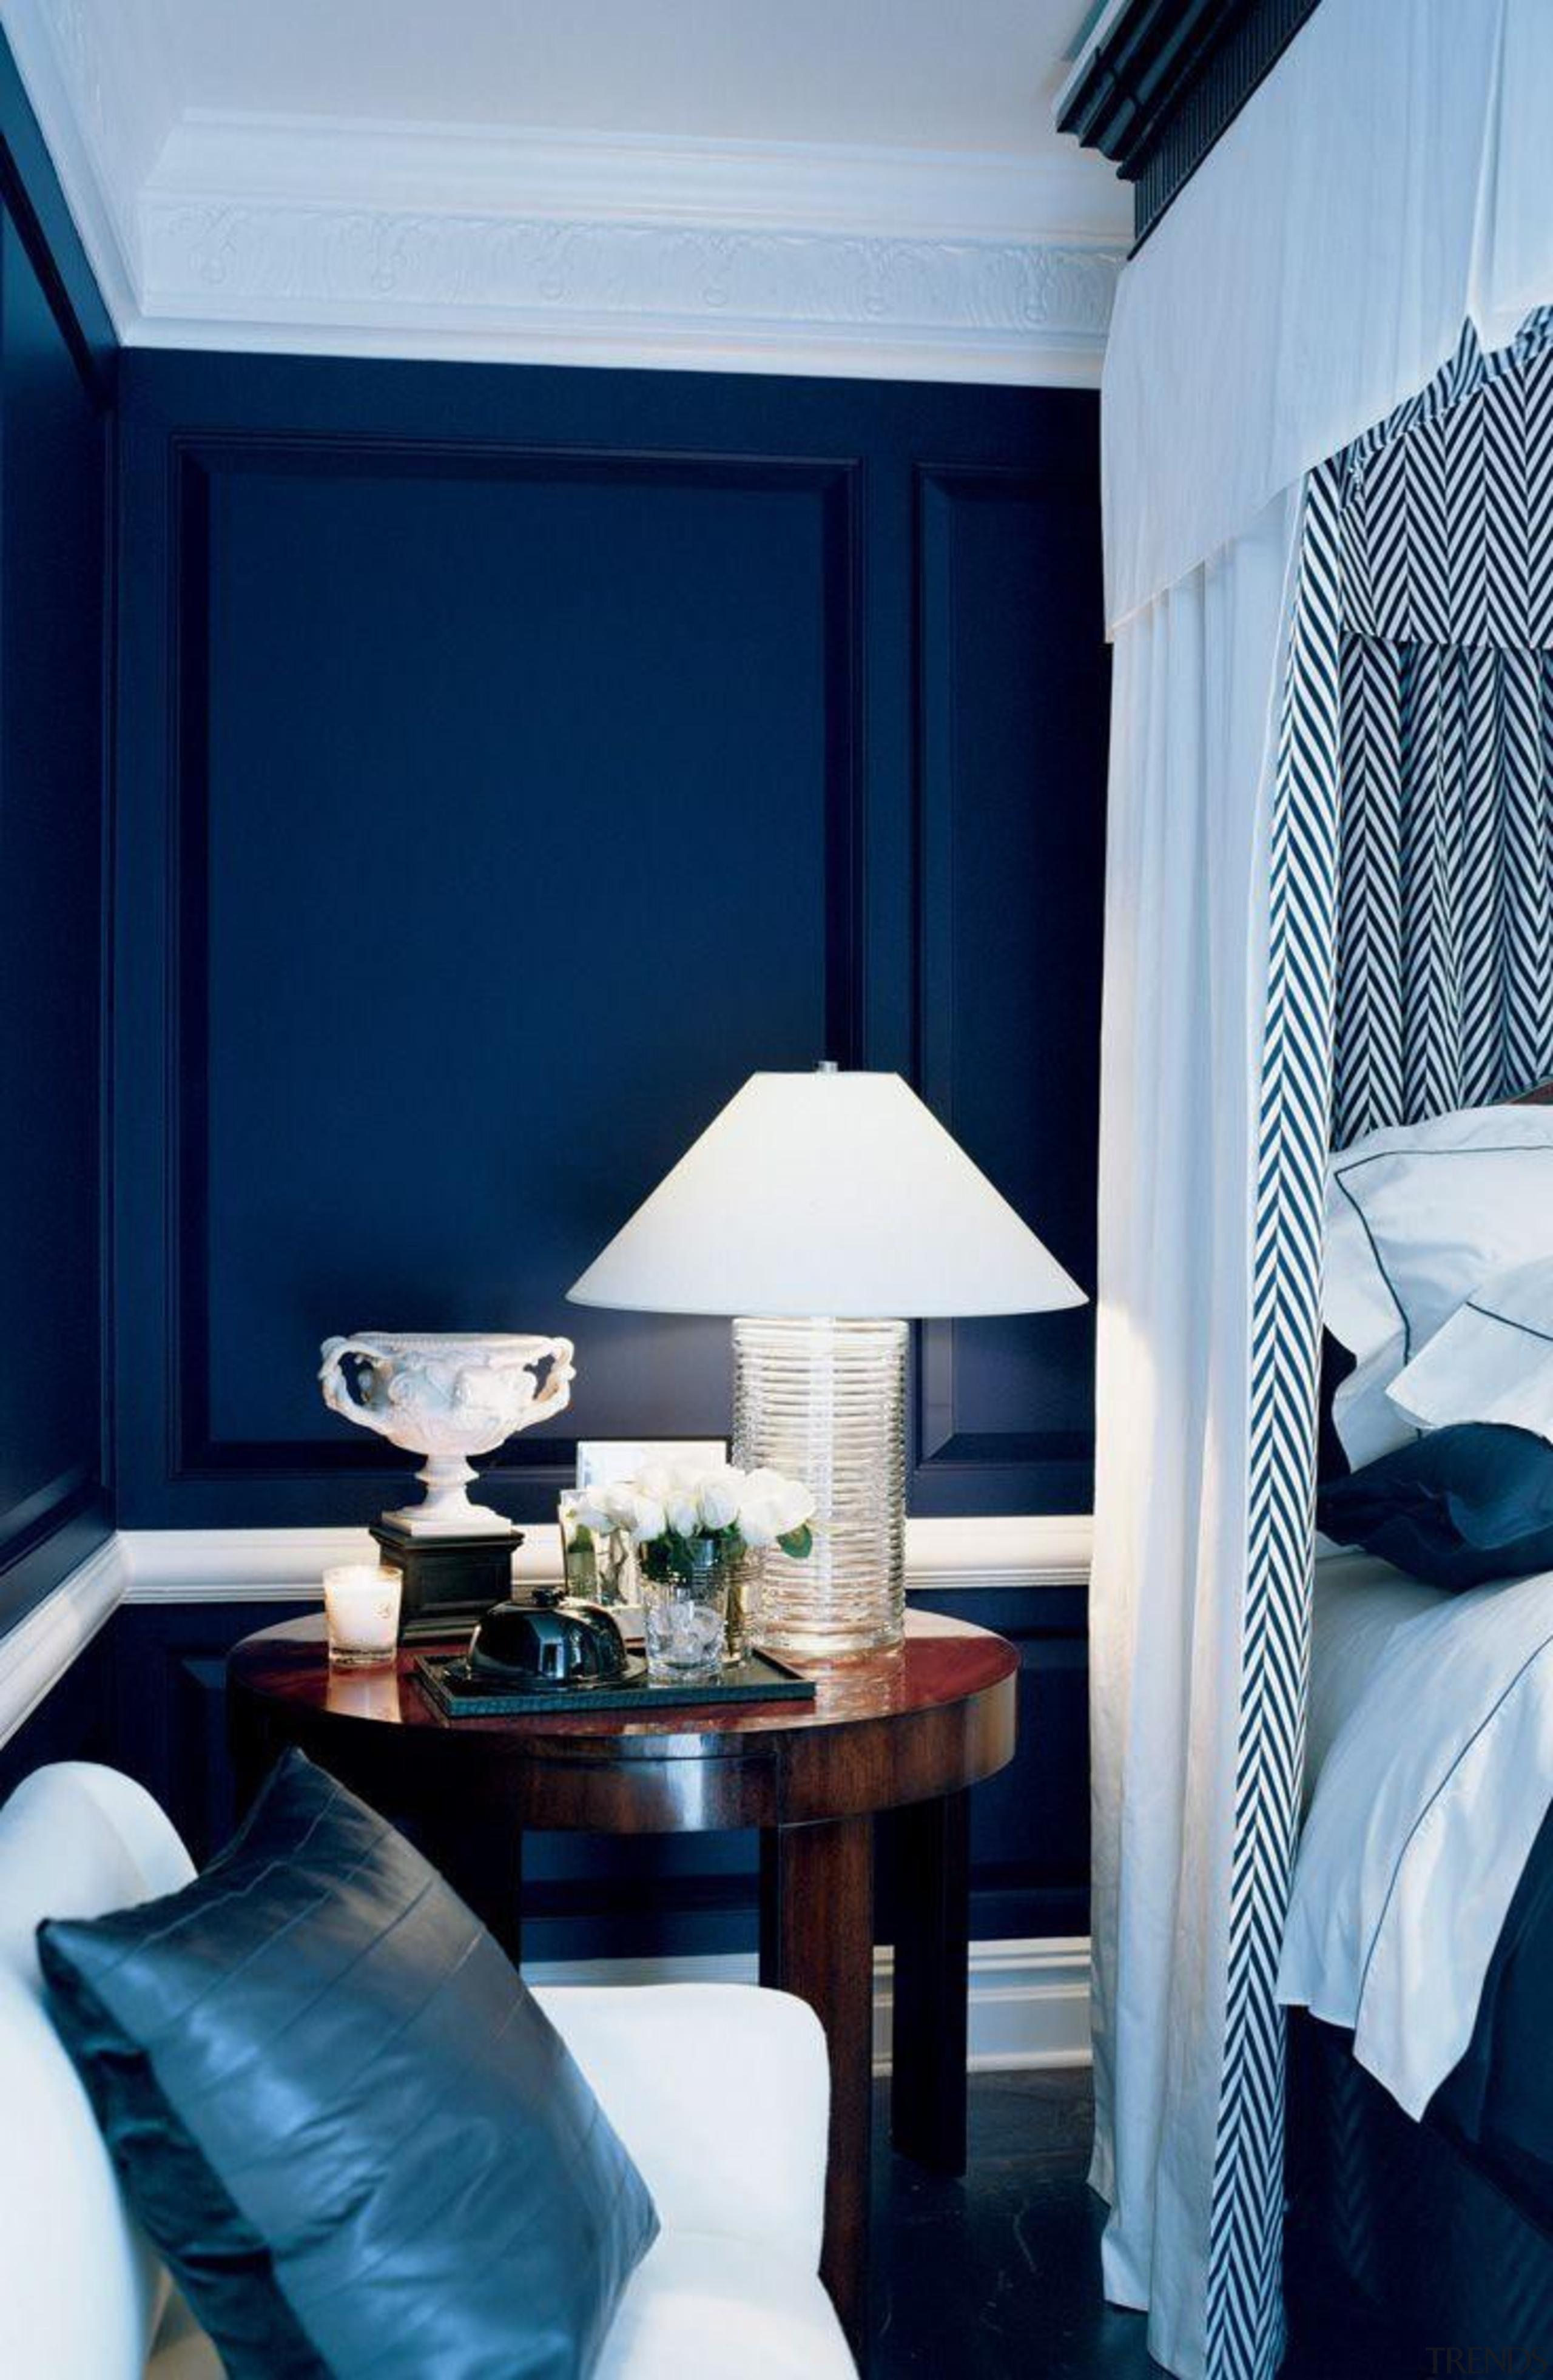 Cerulean Blue - Bedroom - Cerulean Blue - blue, ceiling, furniture, home, interior design, room, suite, window, blue